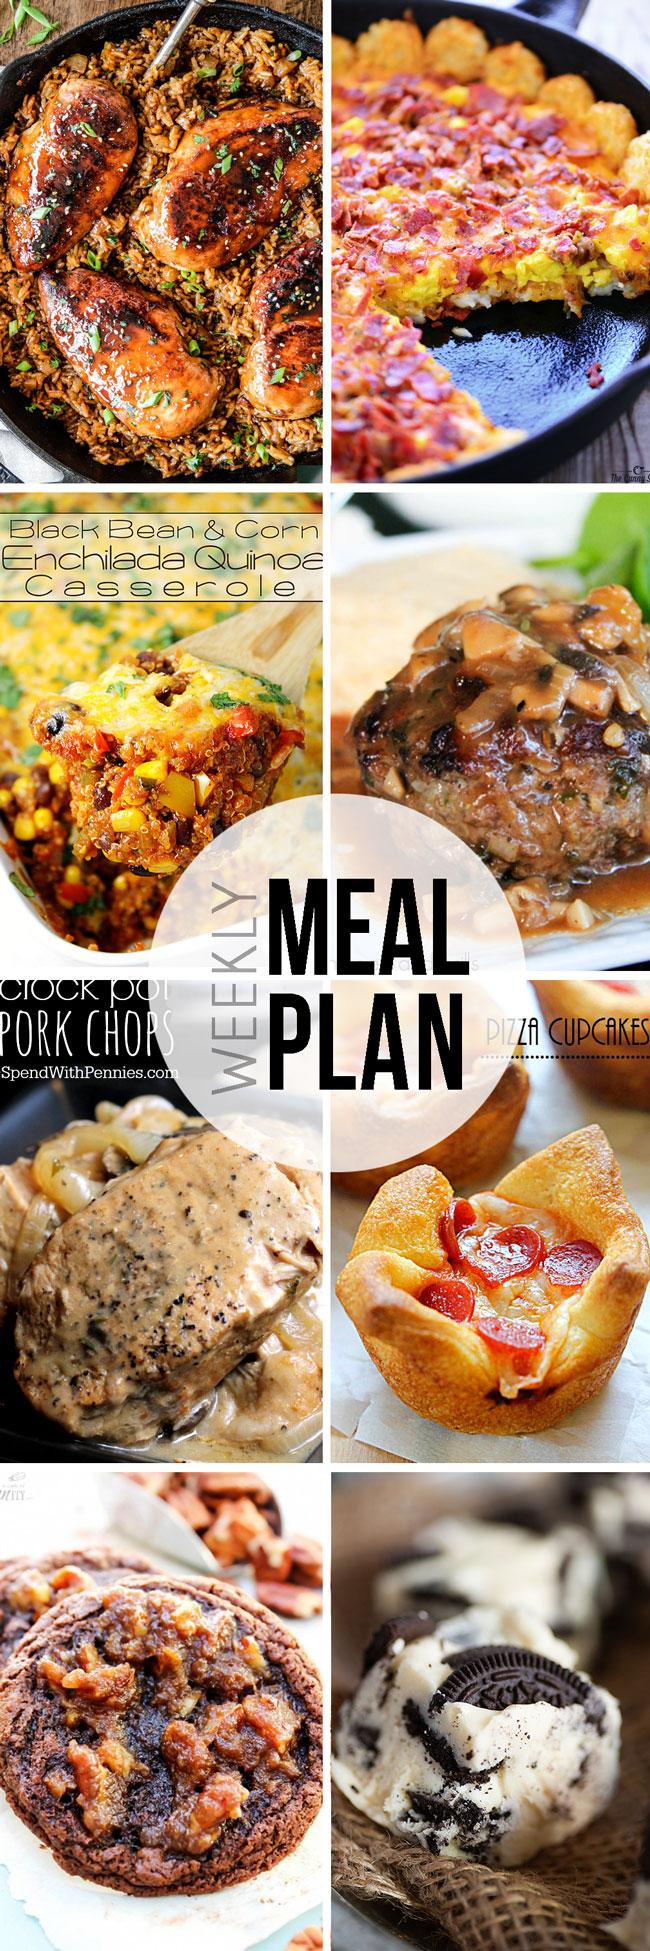 Meal-Plan---Pinterest-24